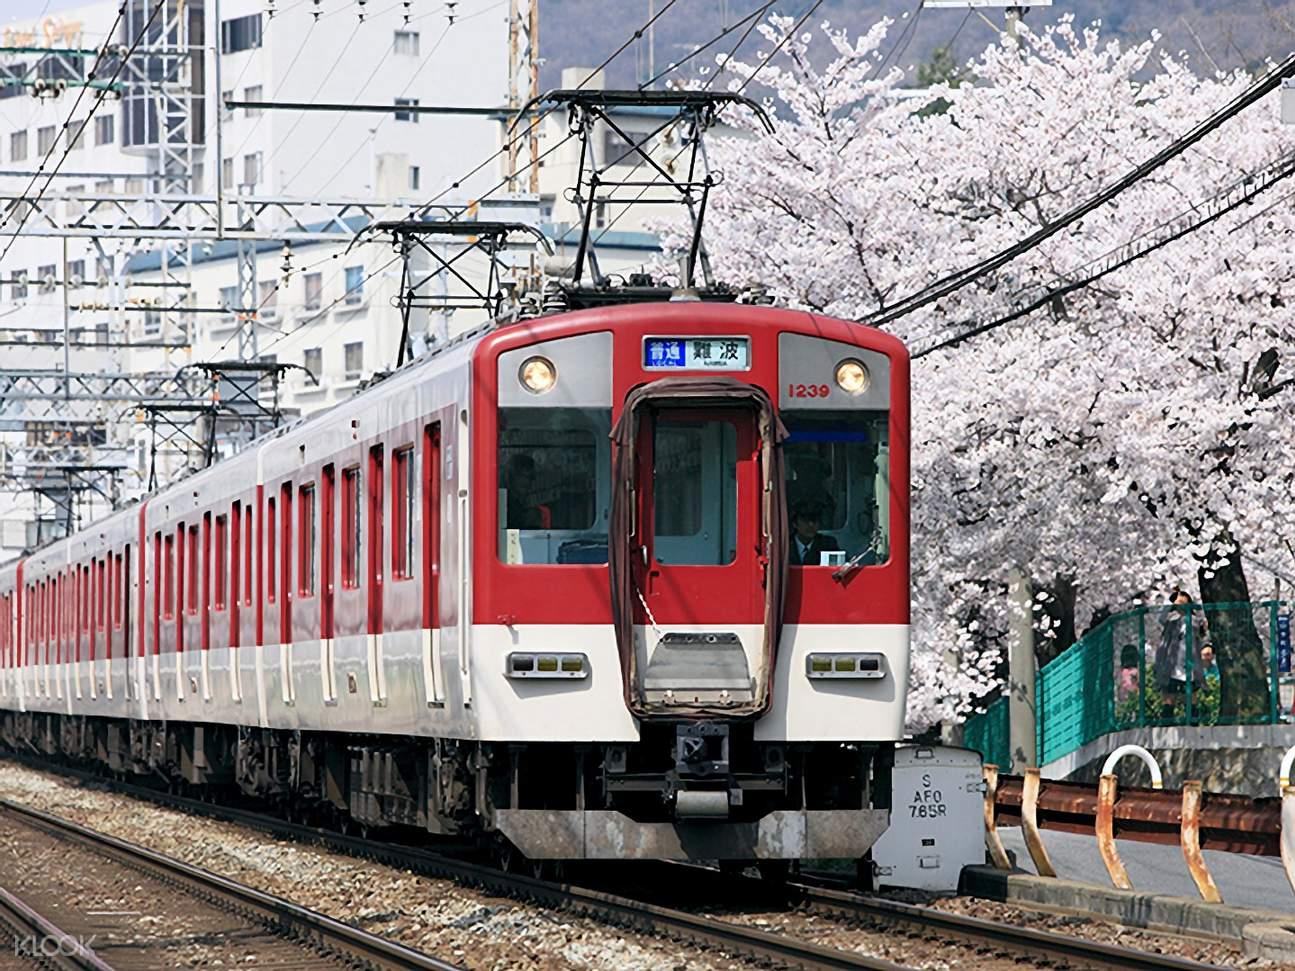 Kintetsu Railway during winter front view